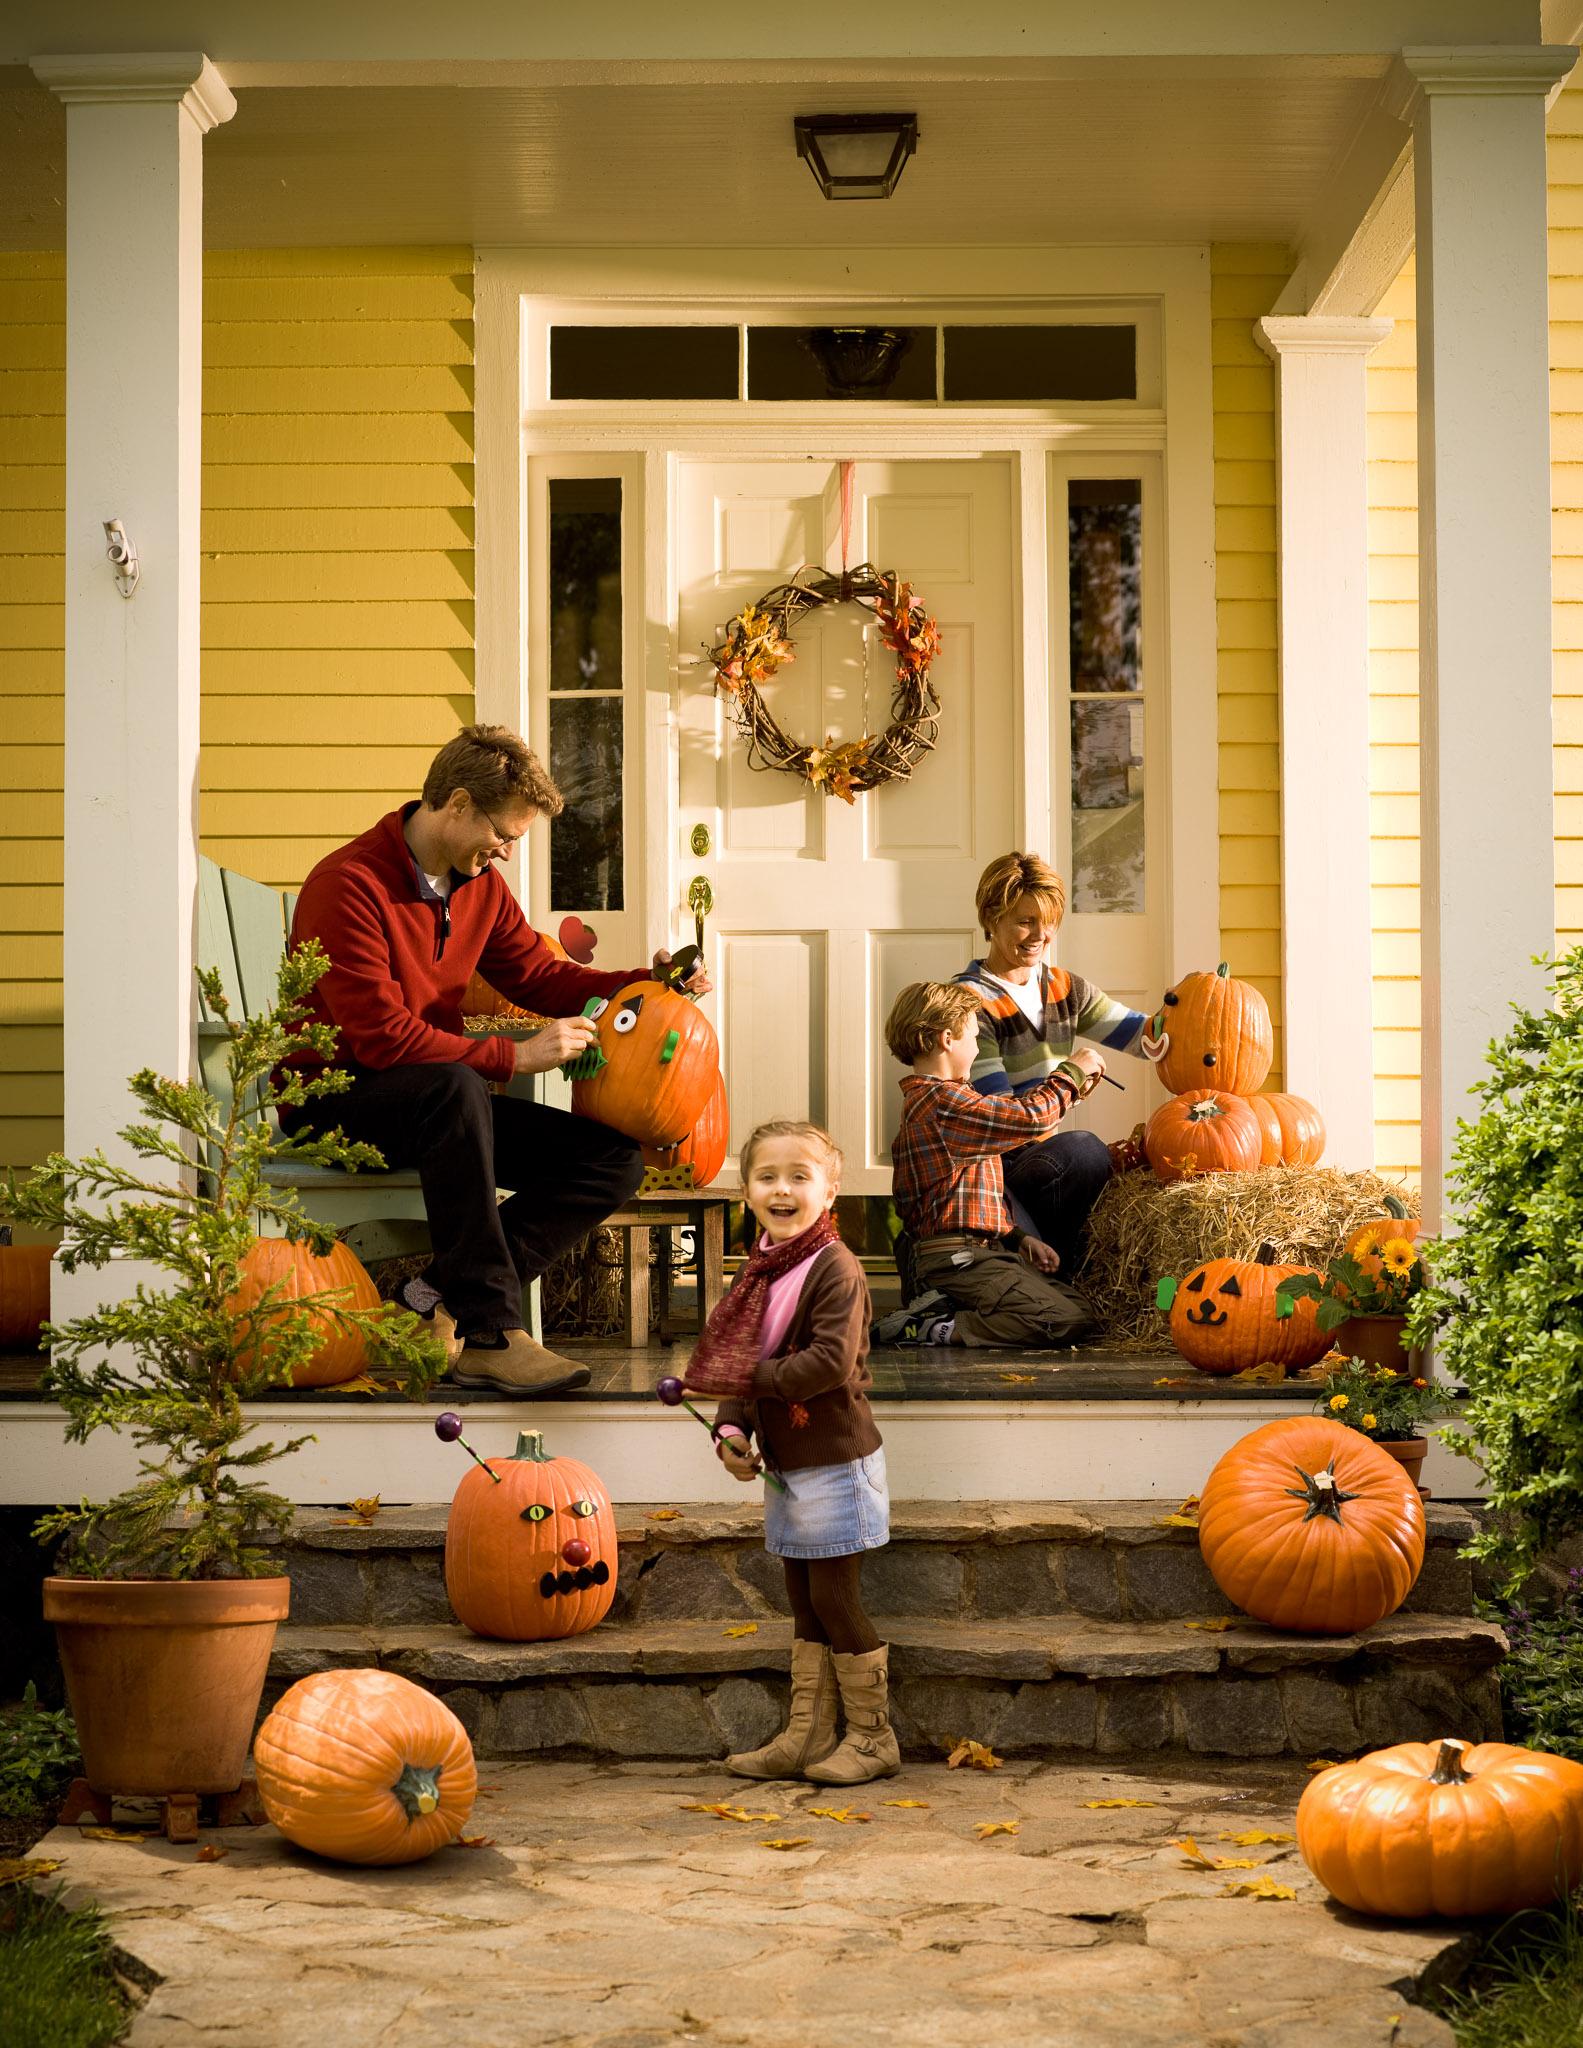 Halloween_Porch_Family.jpg